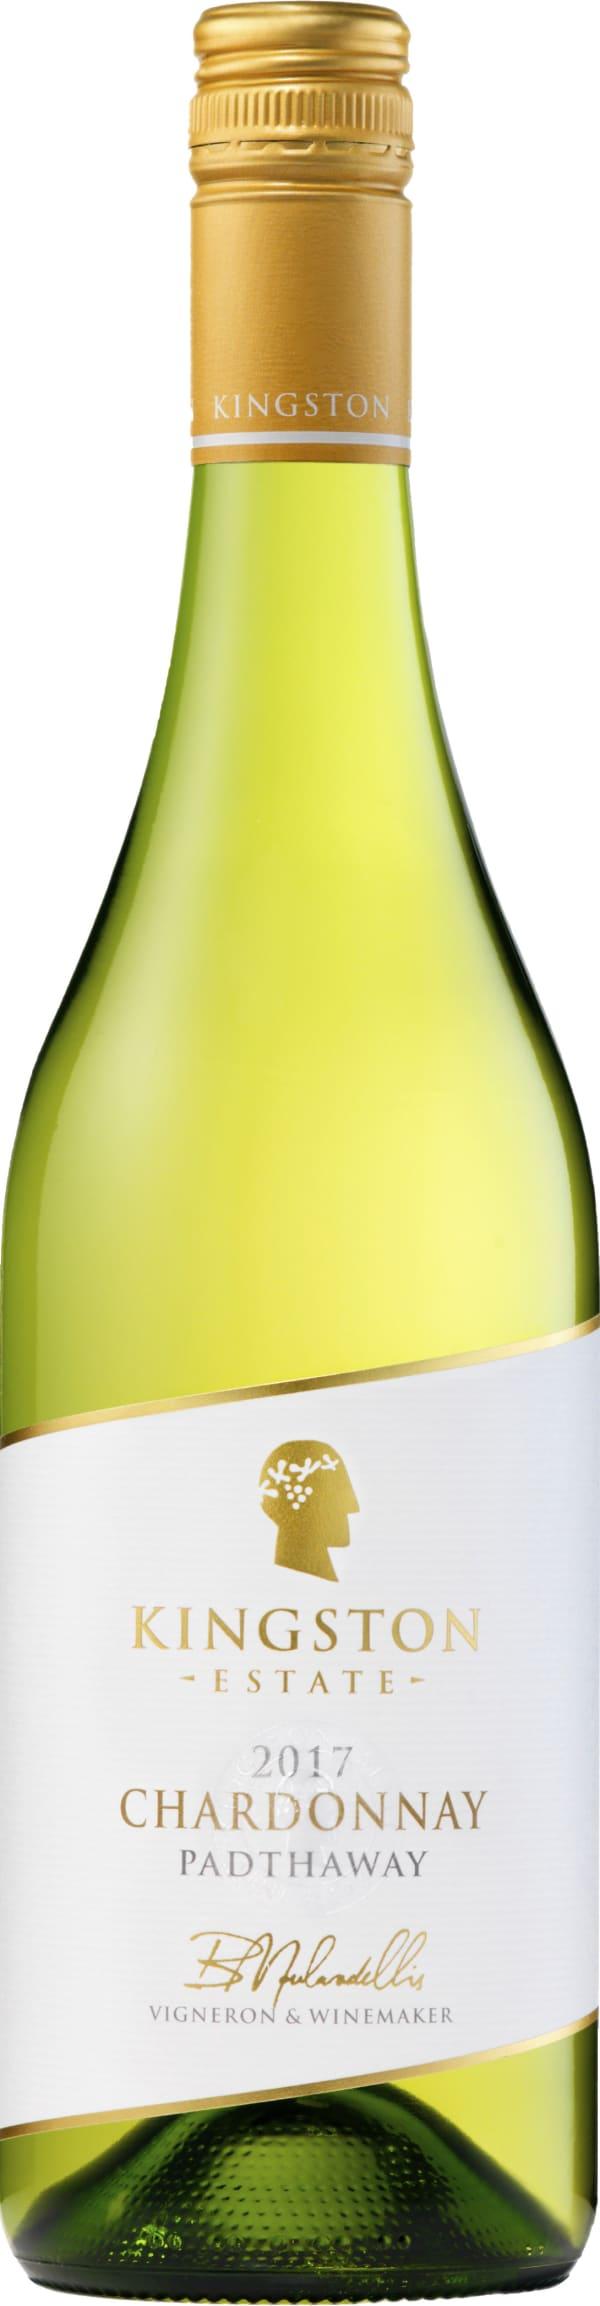 Kingston Estate Chardonnay 2017